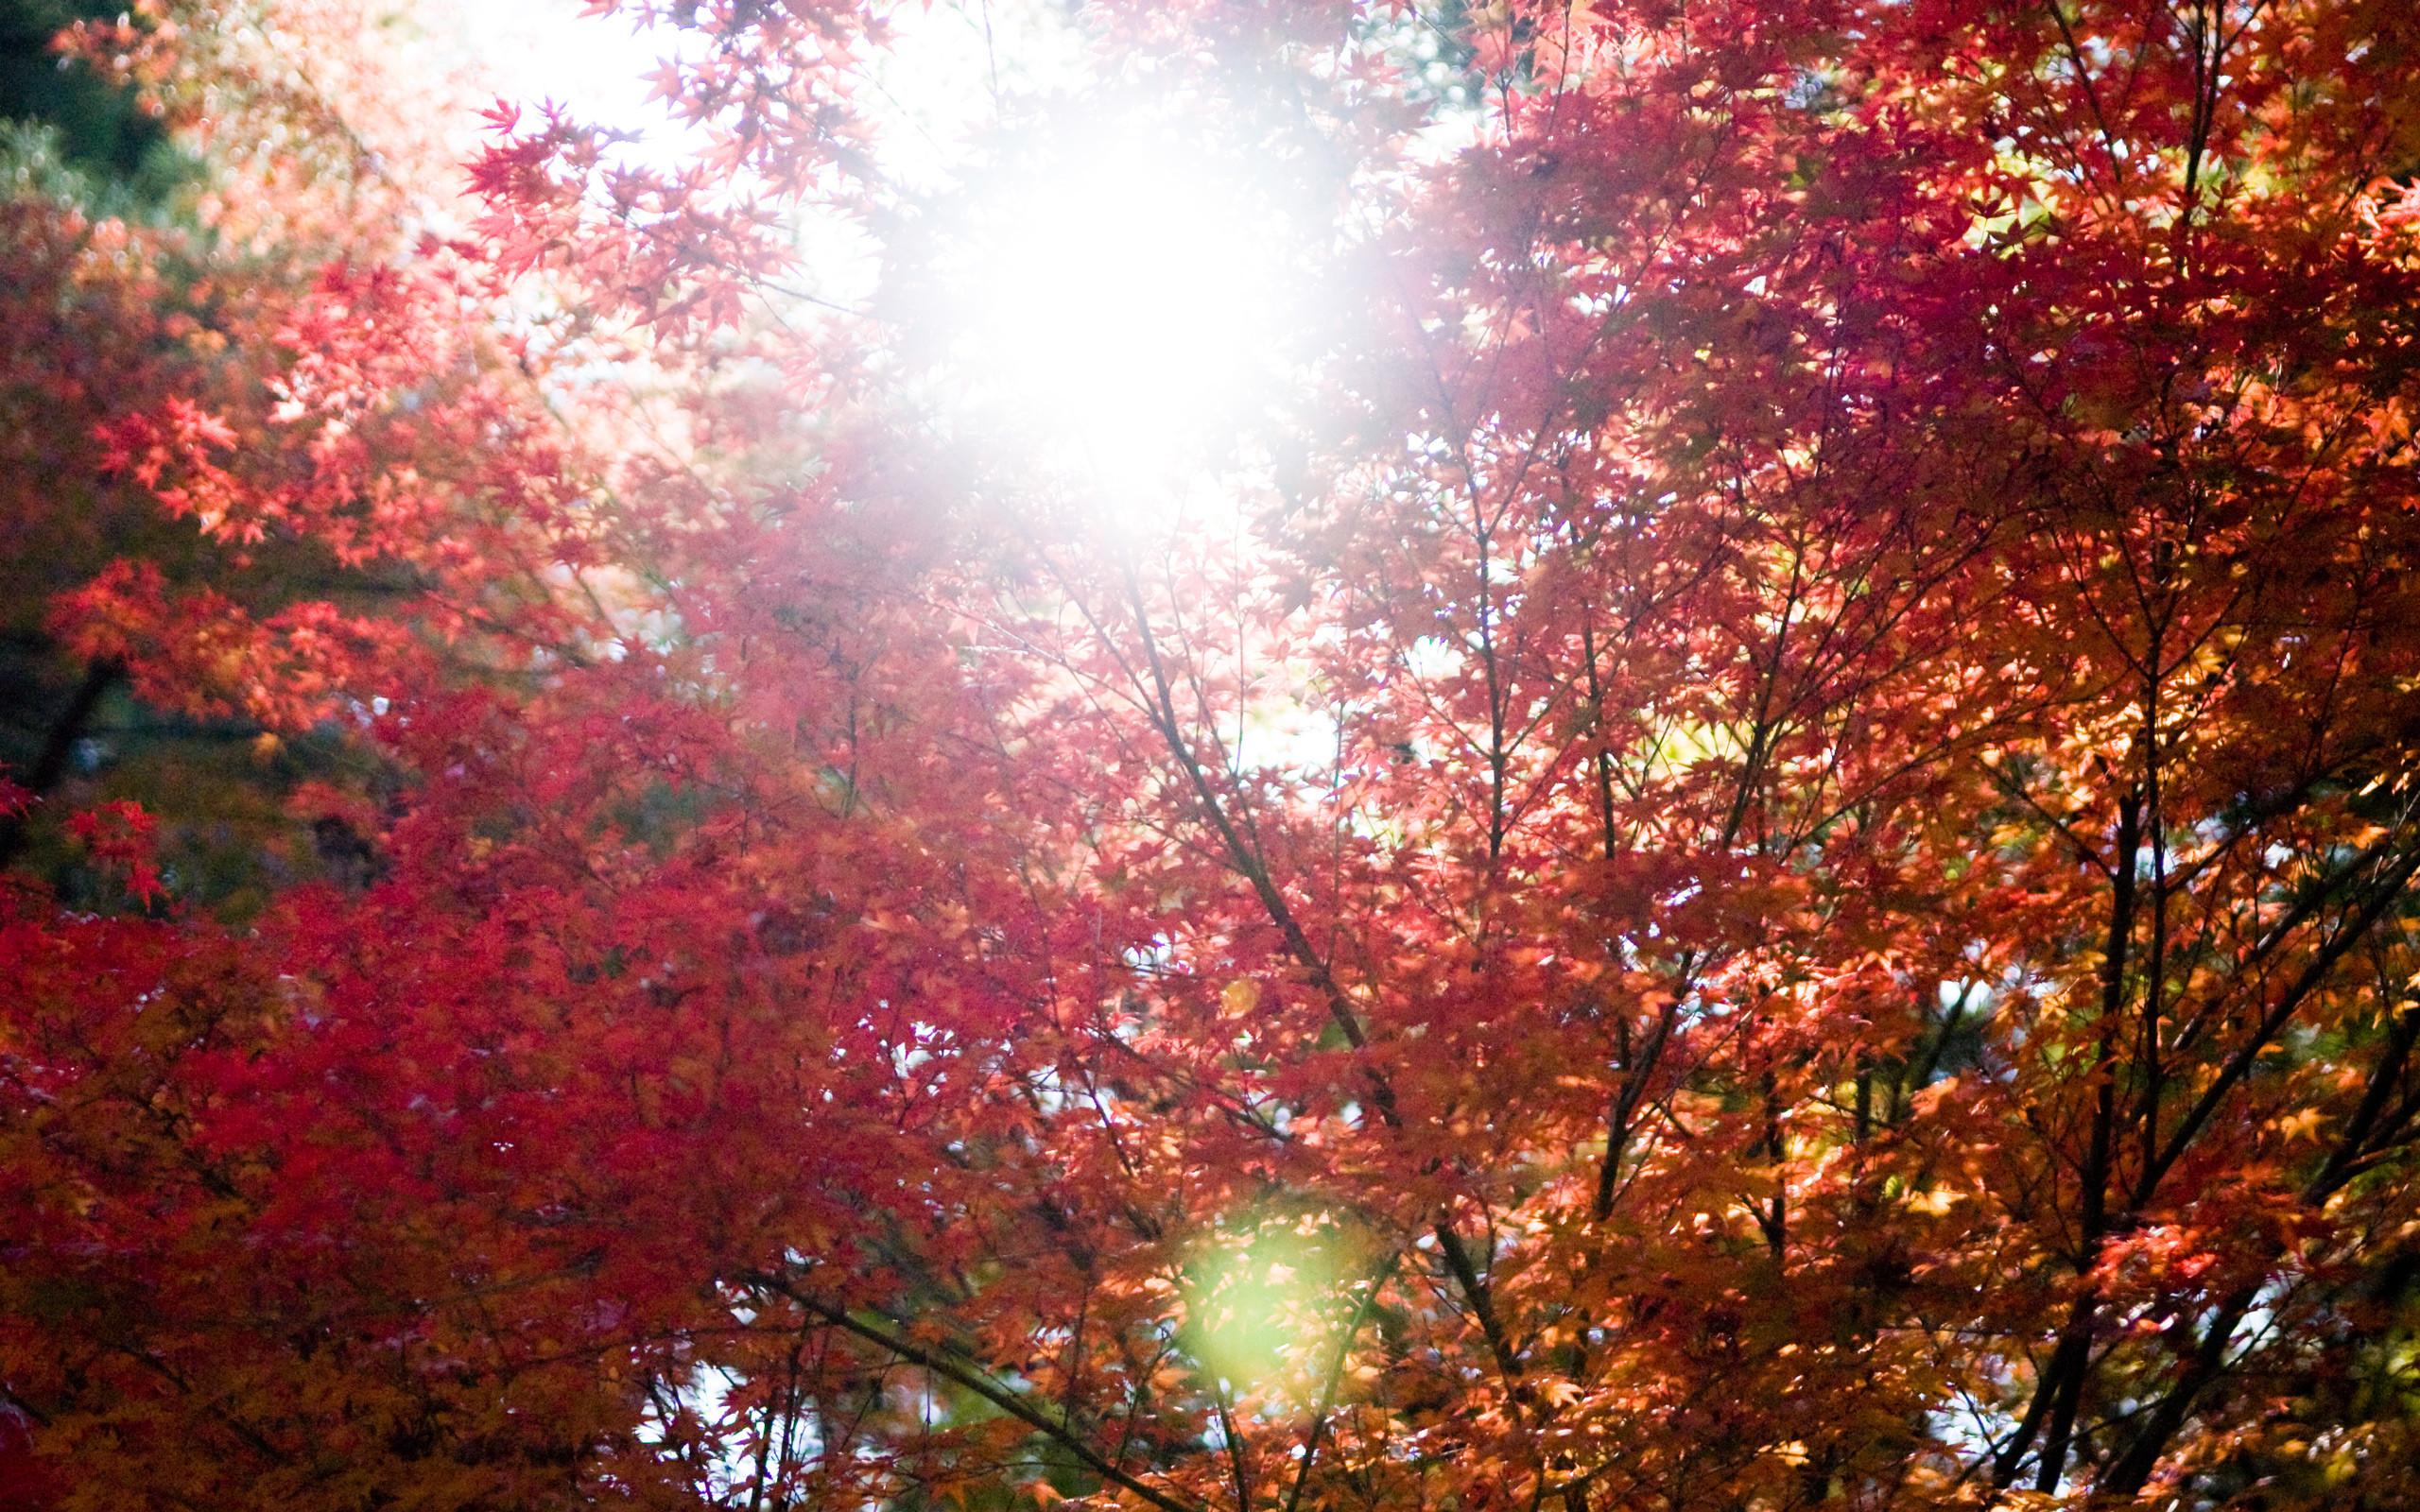 Fall Foliage Wallpaper Widescreen Fall Foliage Wallpaper For Desktop 183 ①